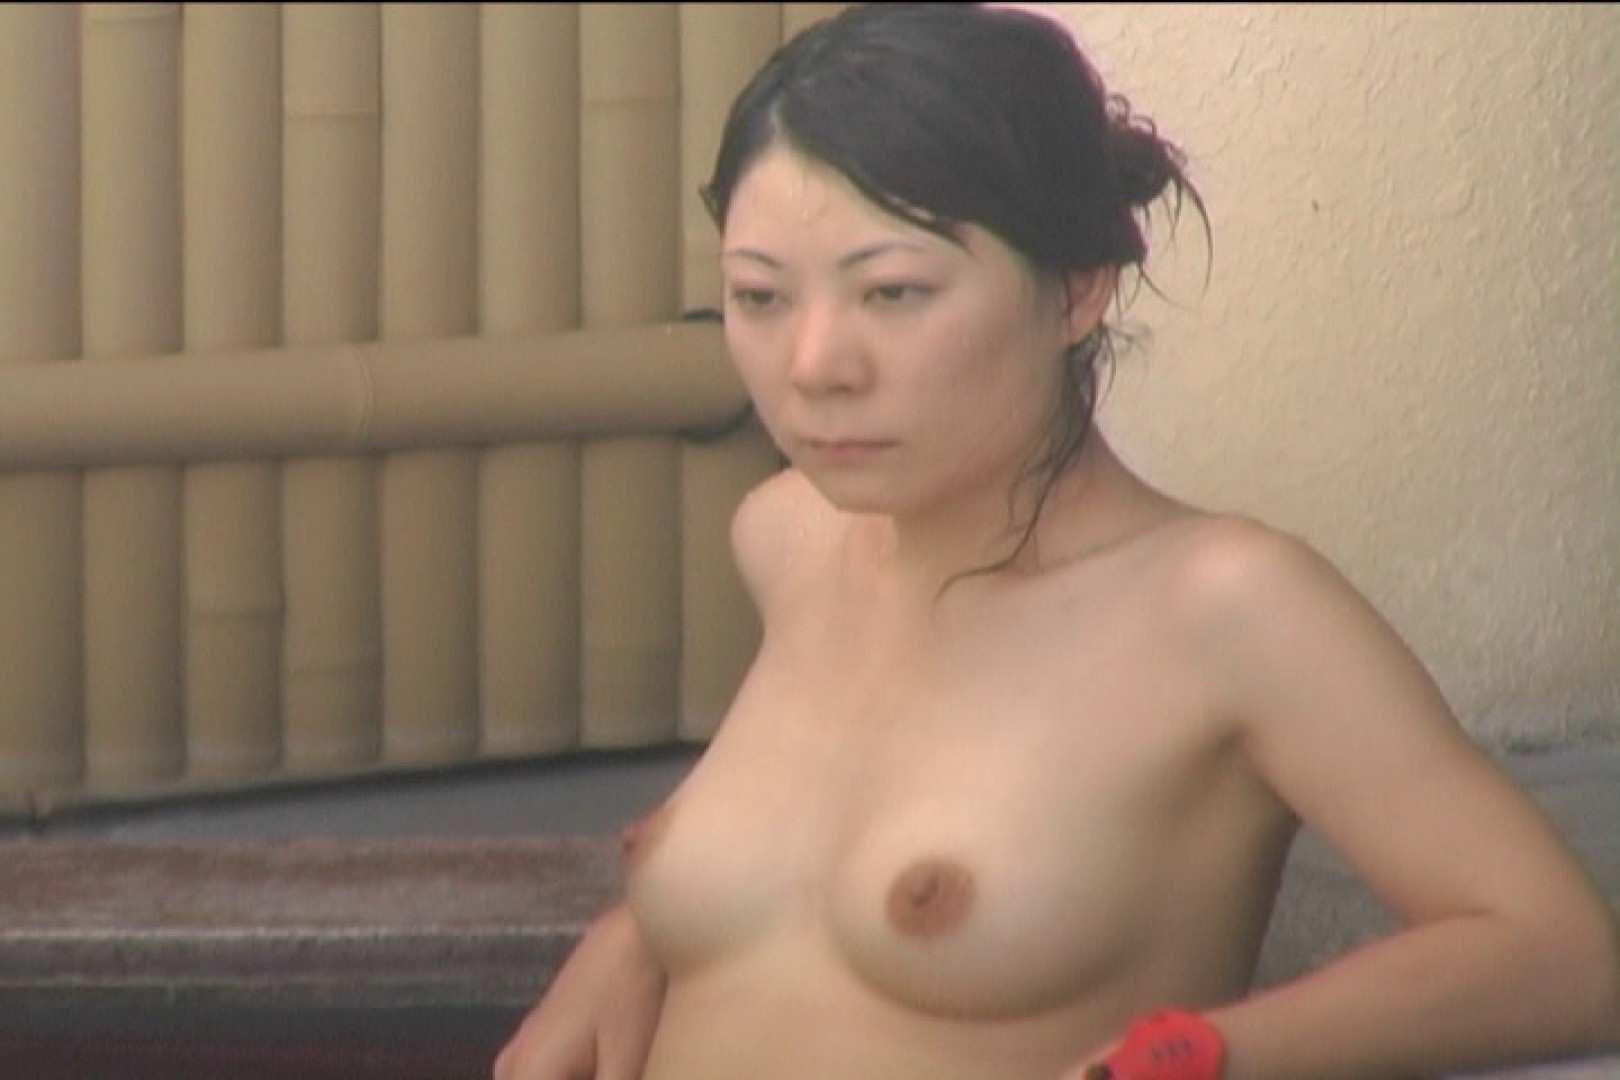 Aquaな露天風呂Vol.533 盗撮  68連発 12